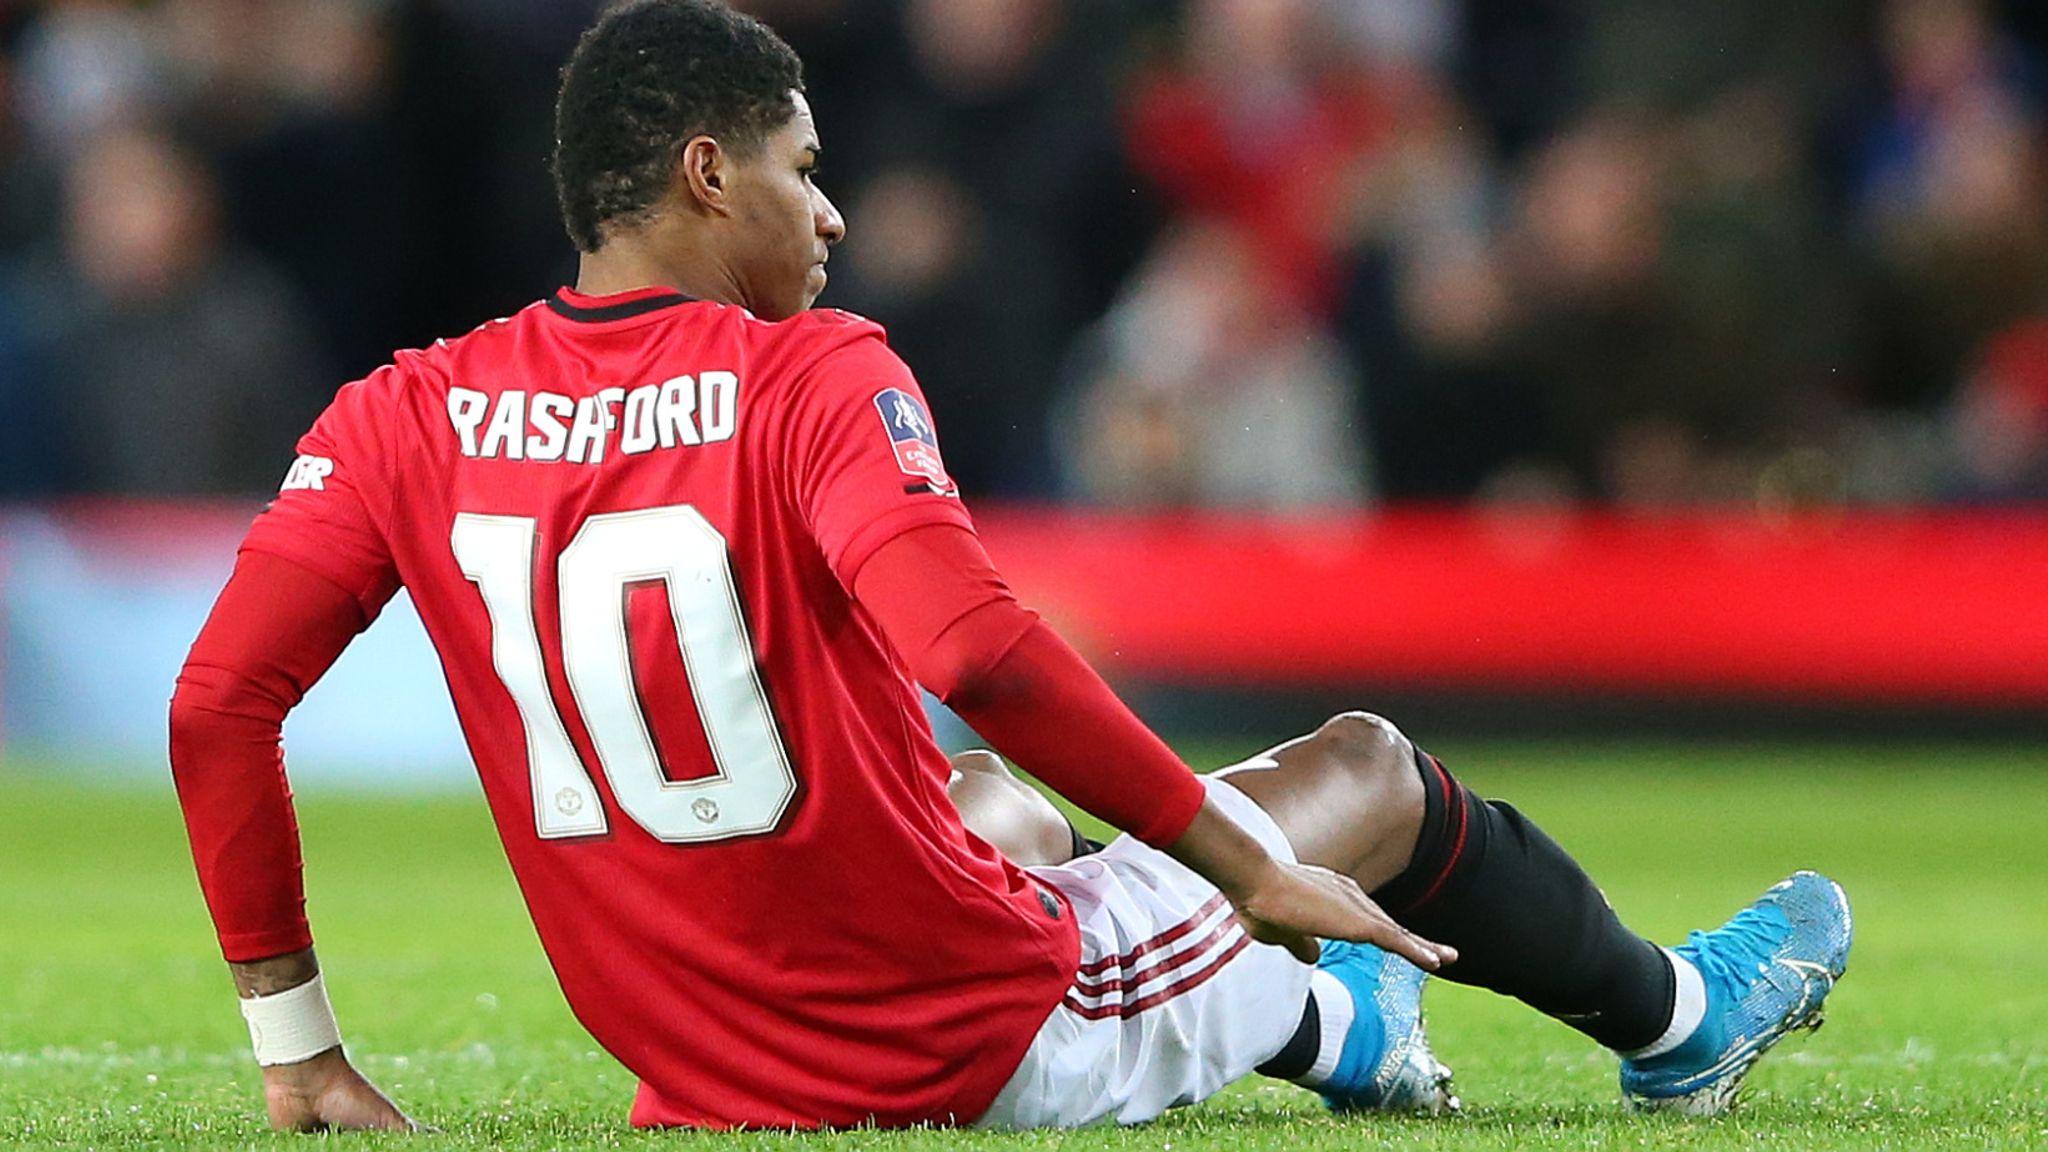 Marcus Rashford Man Utd Forward Vows To Return From Back